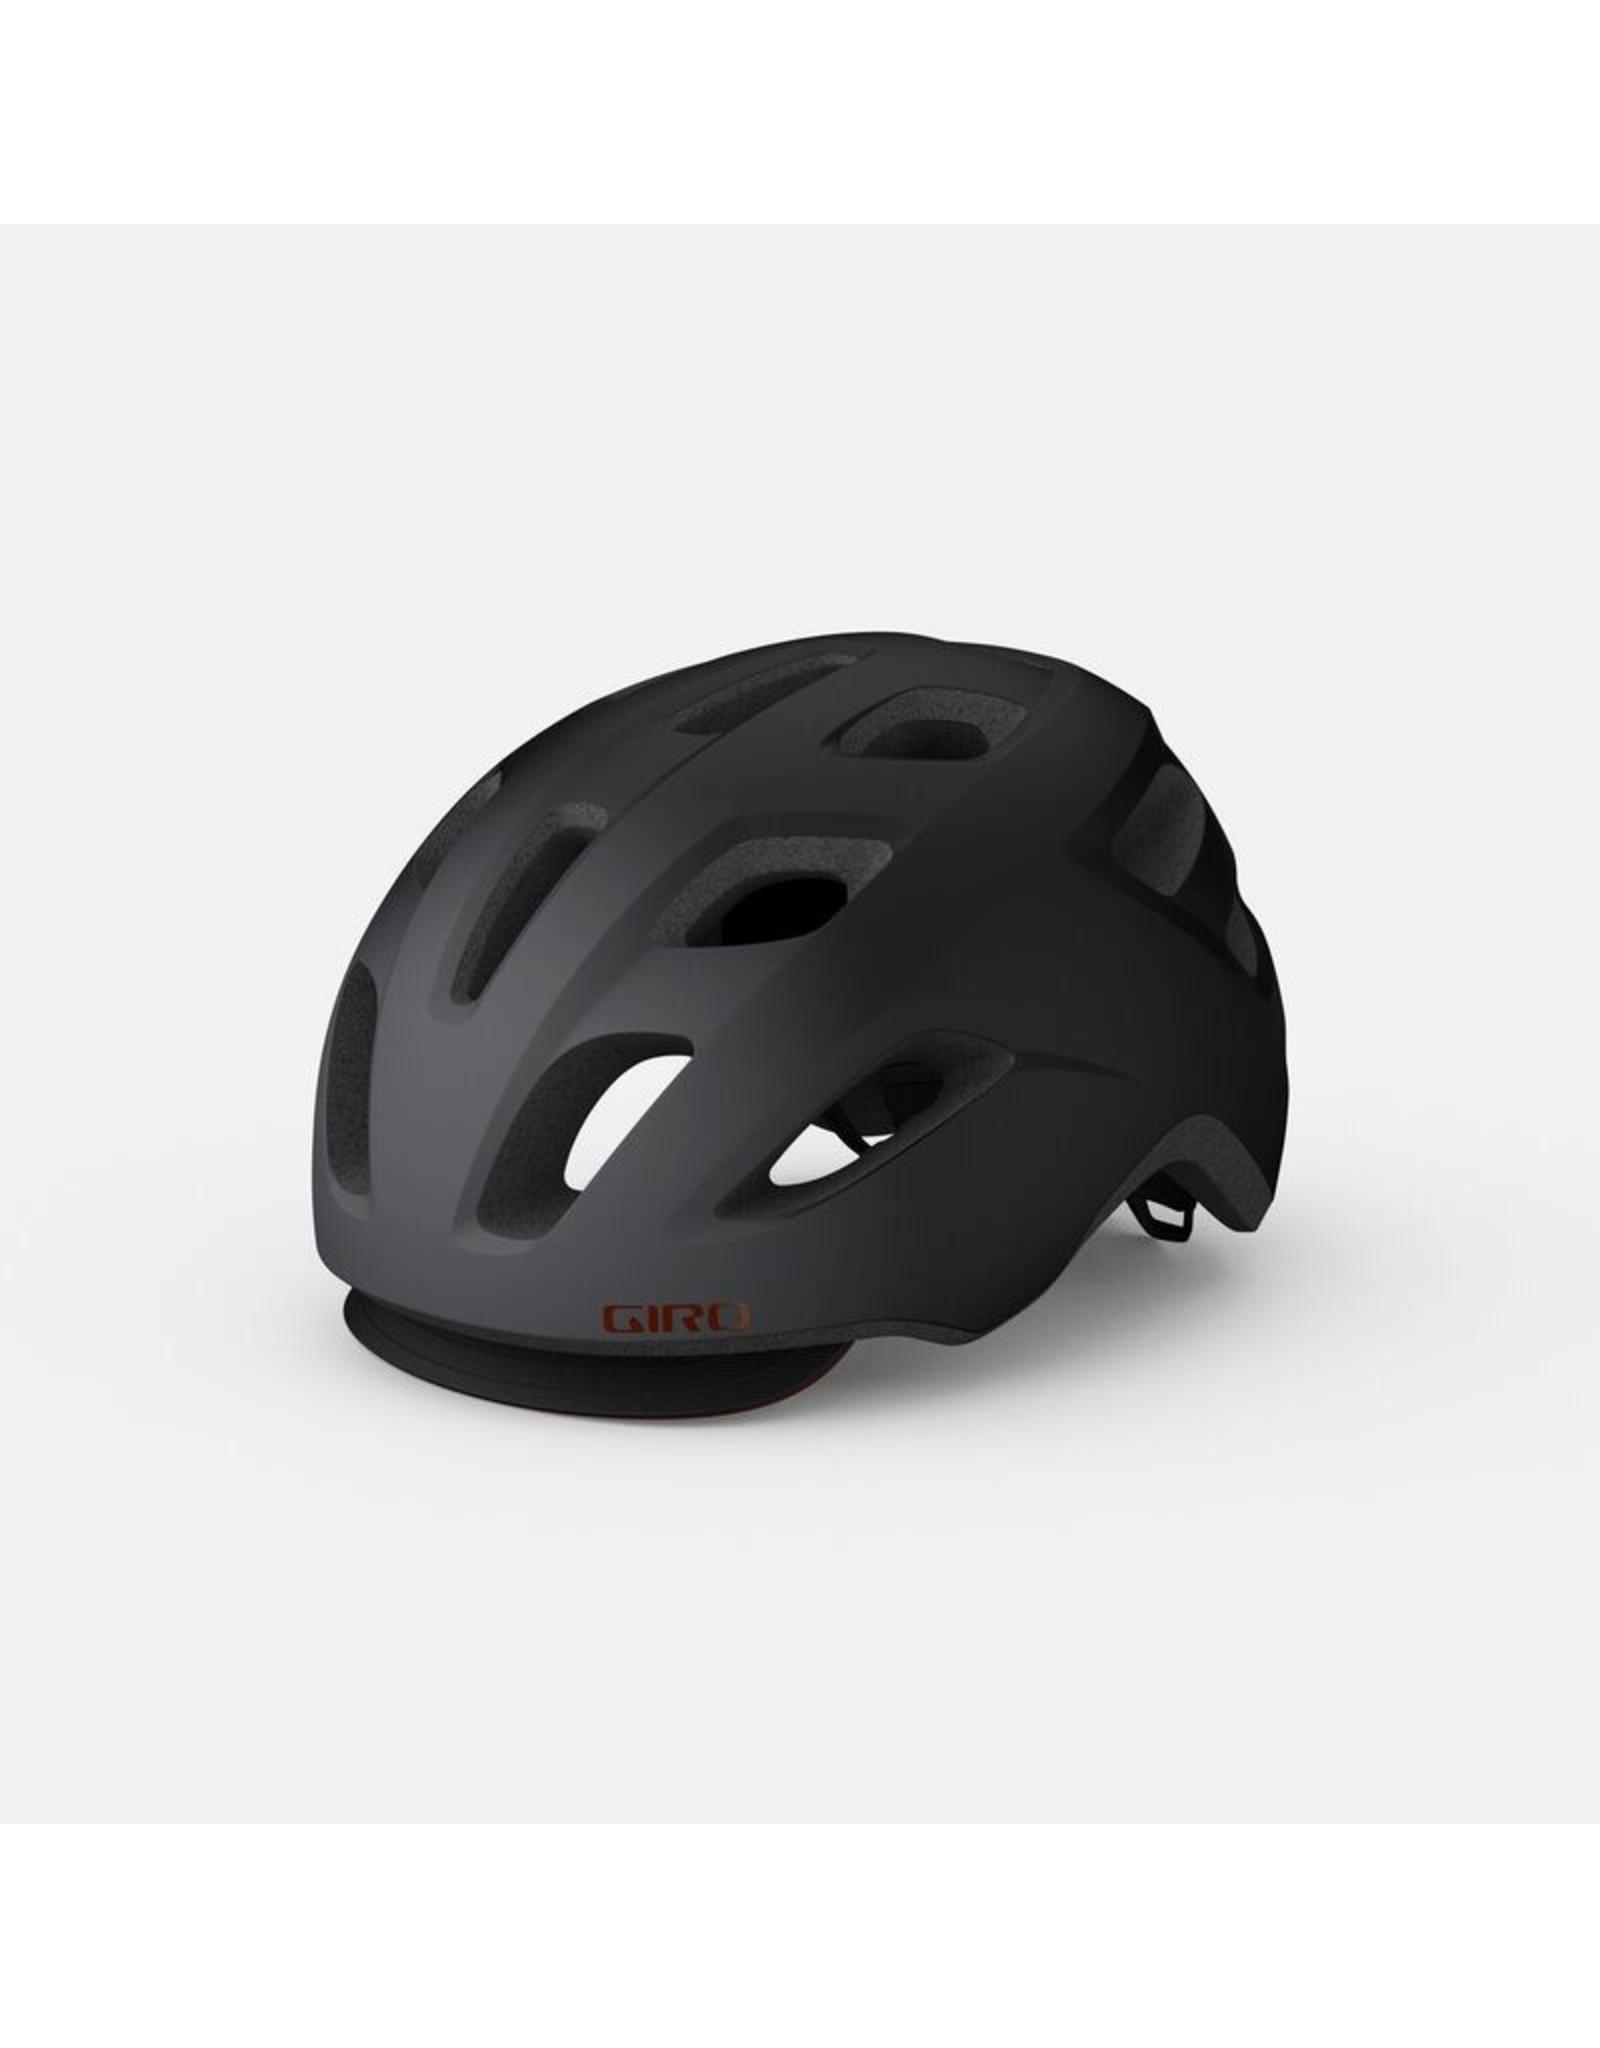 Giro GIRO, Cormick MIPS Helmet